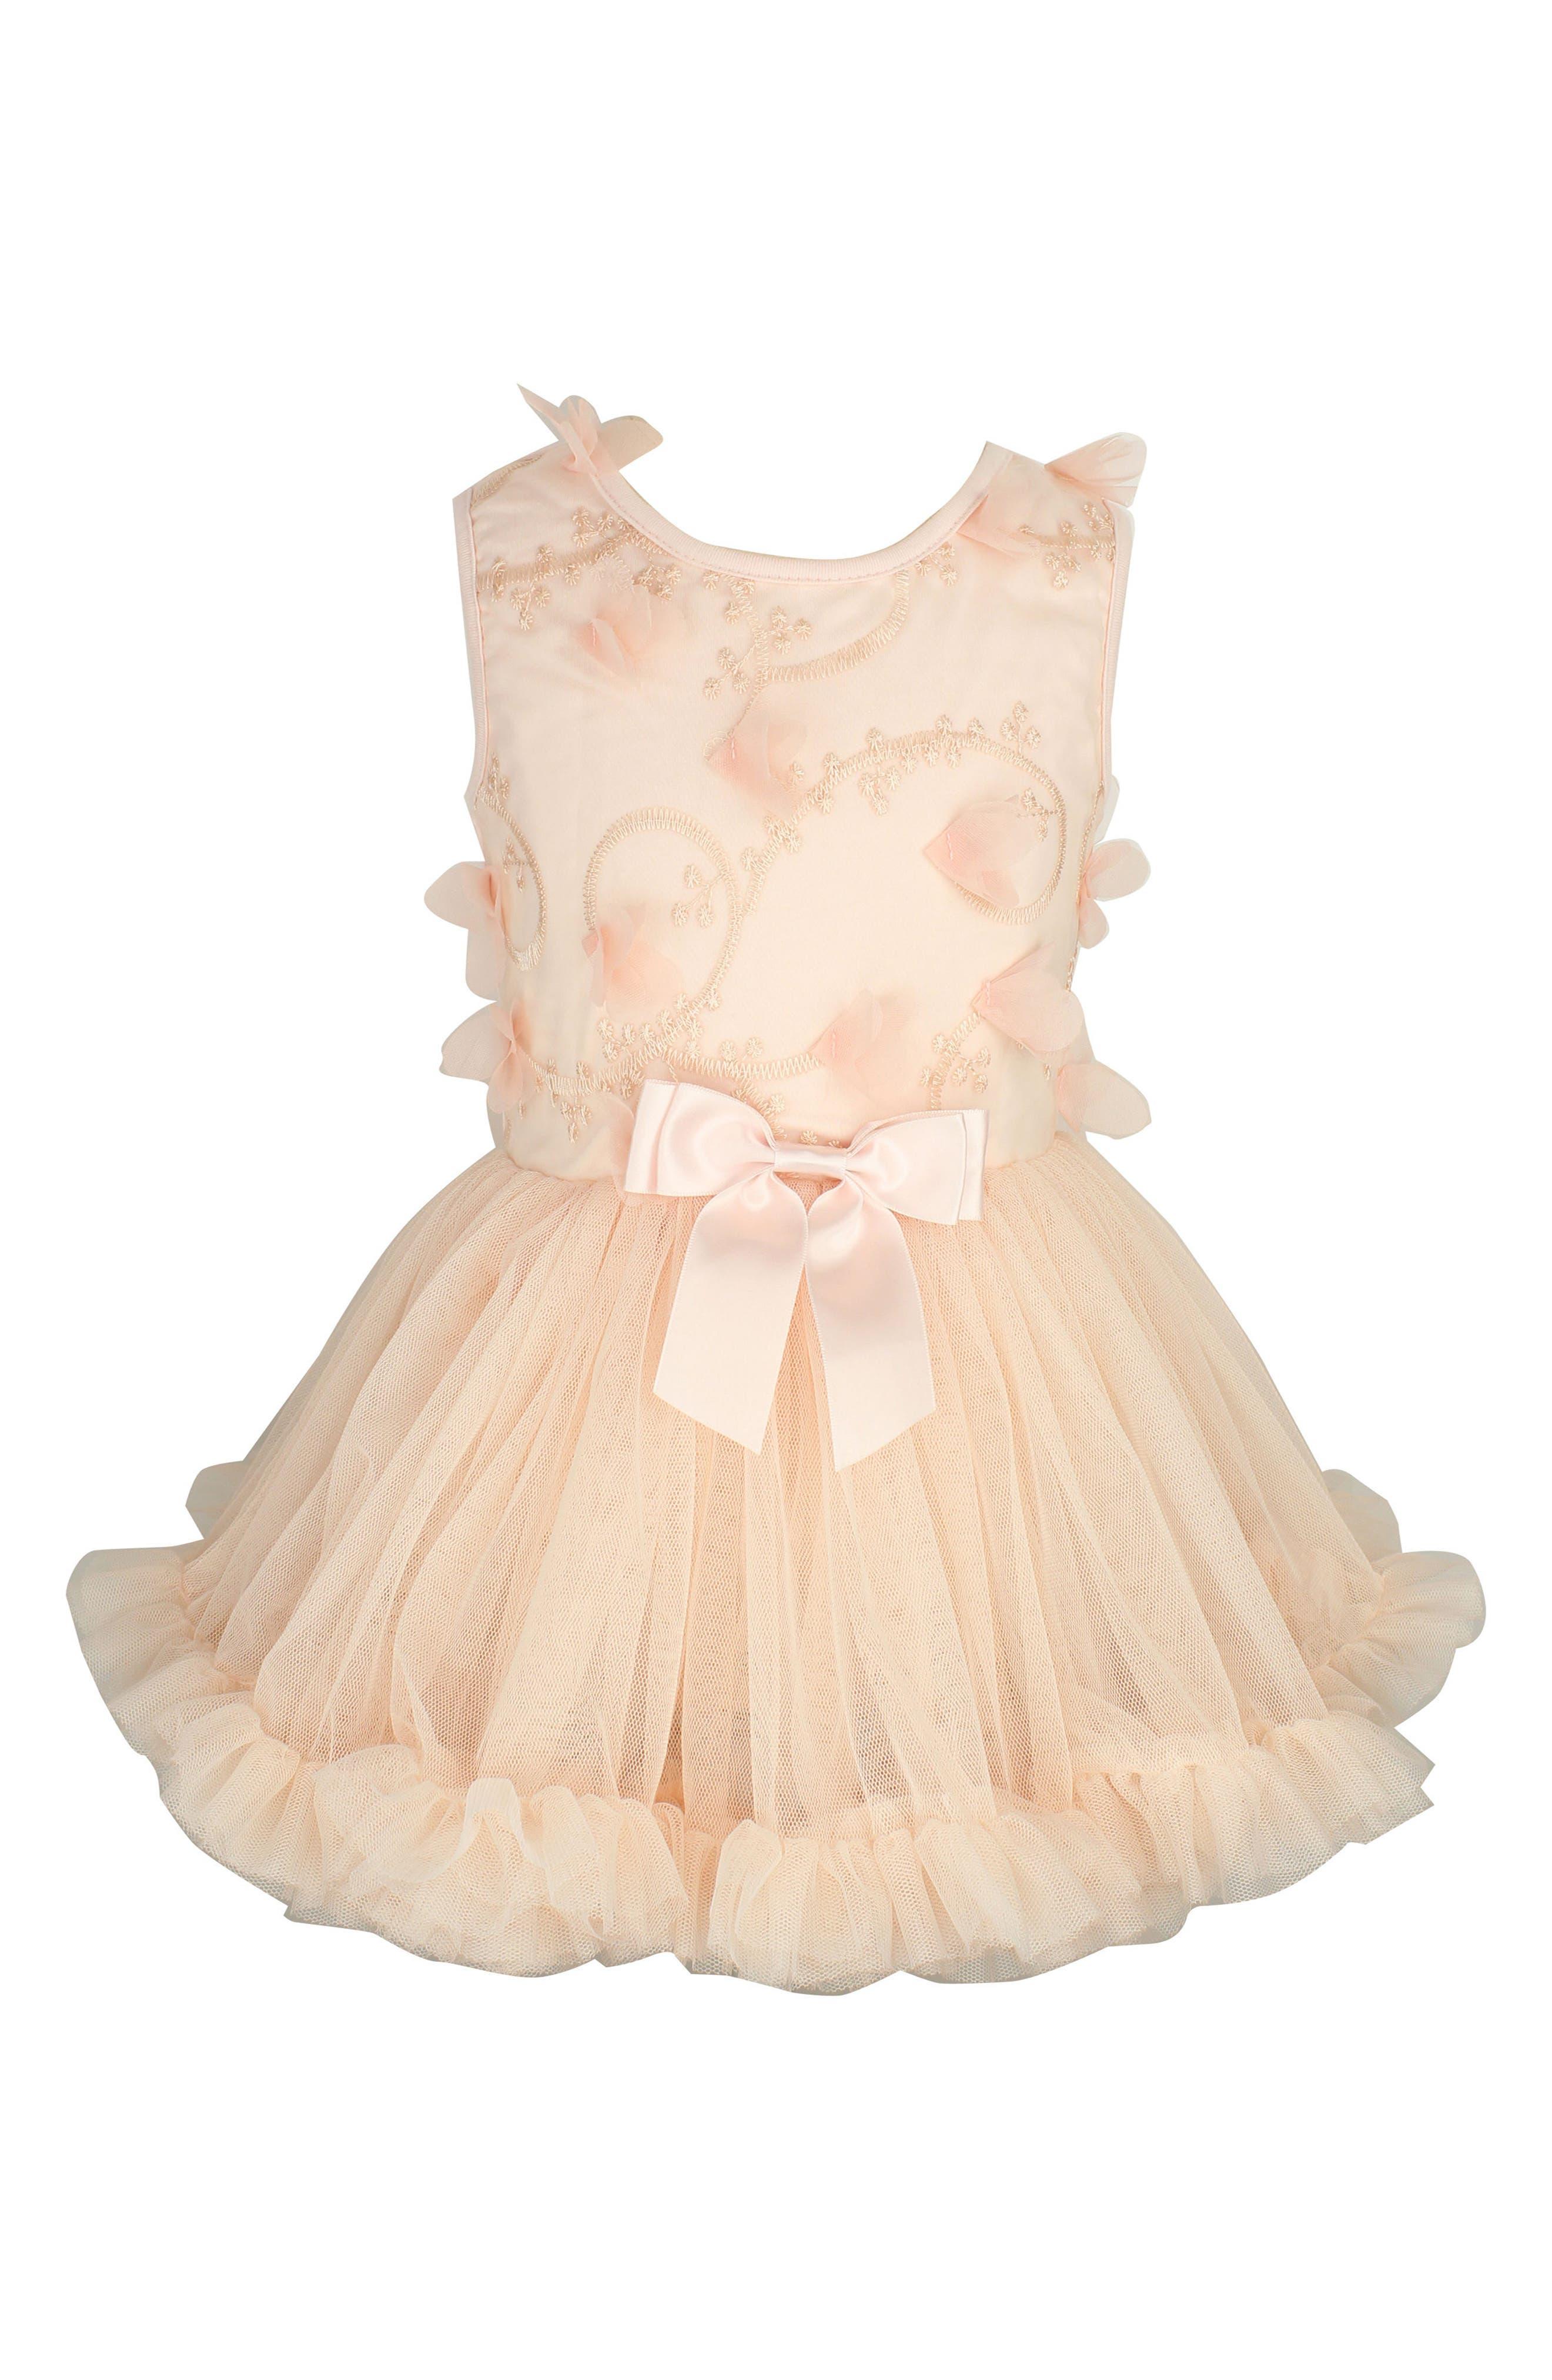 Butterfly Tutu Dress,                         Main,                         color, Peach